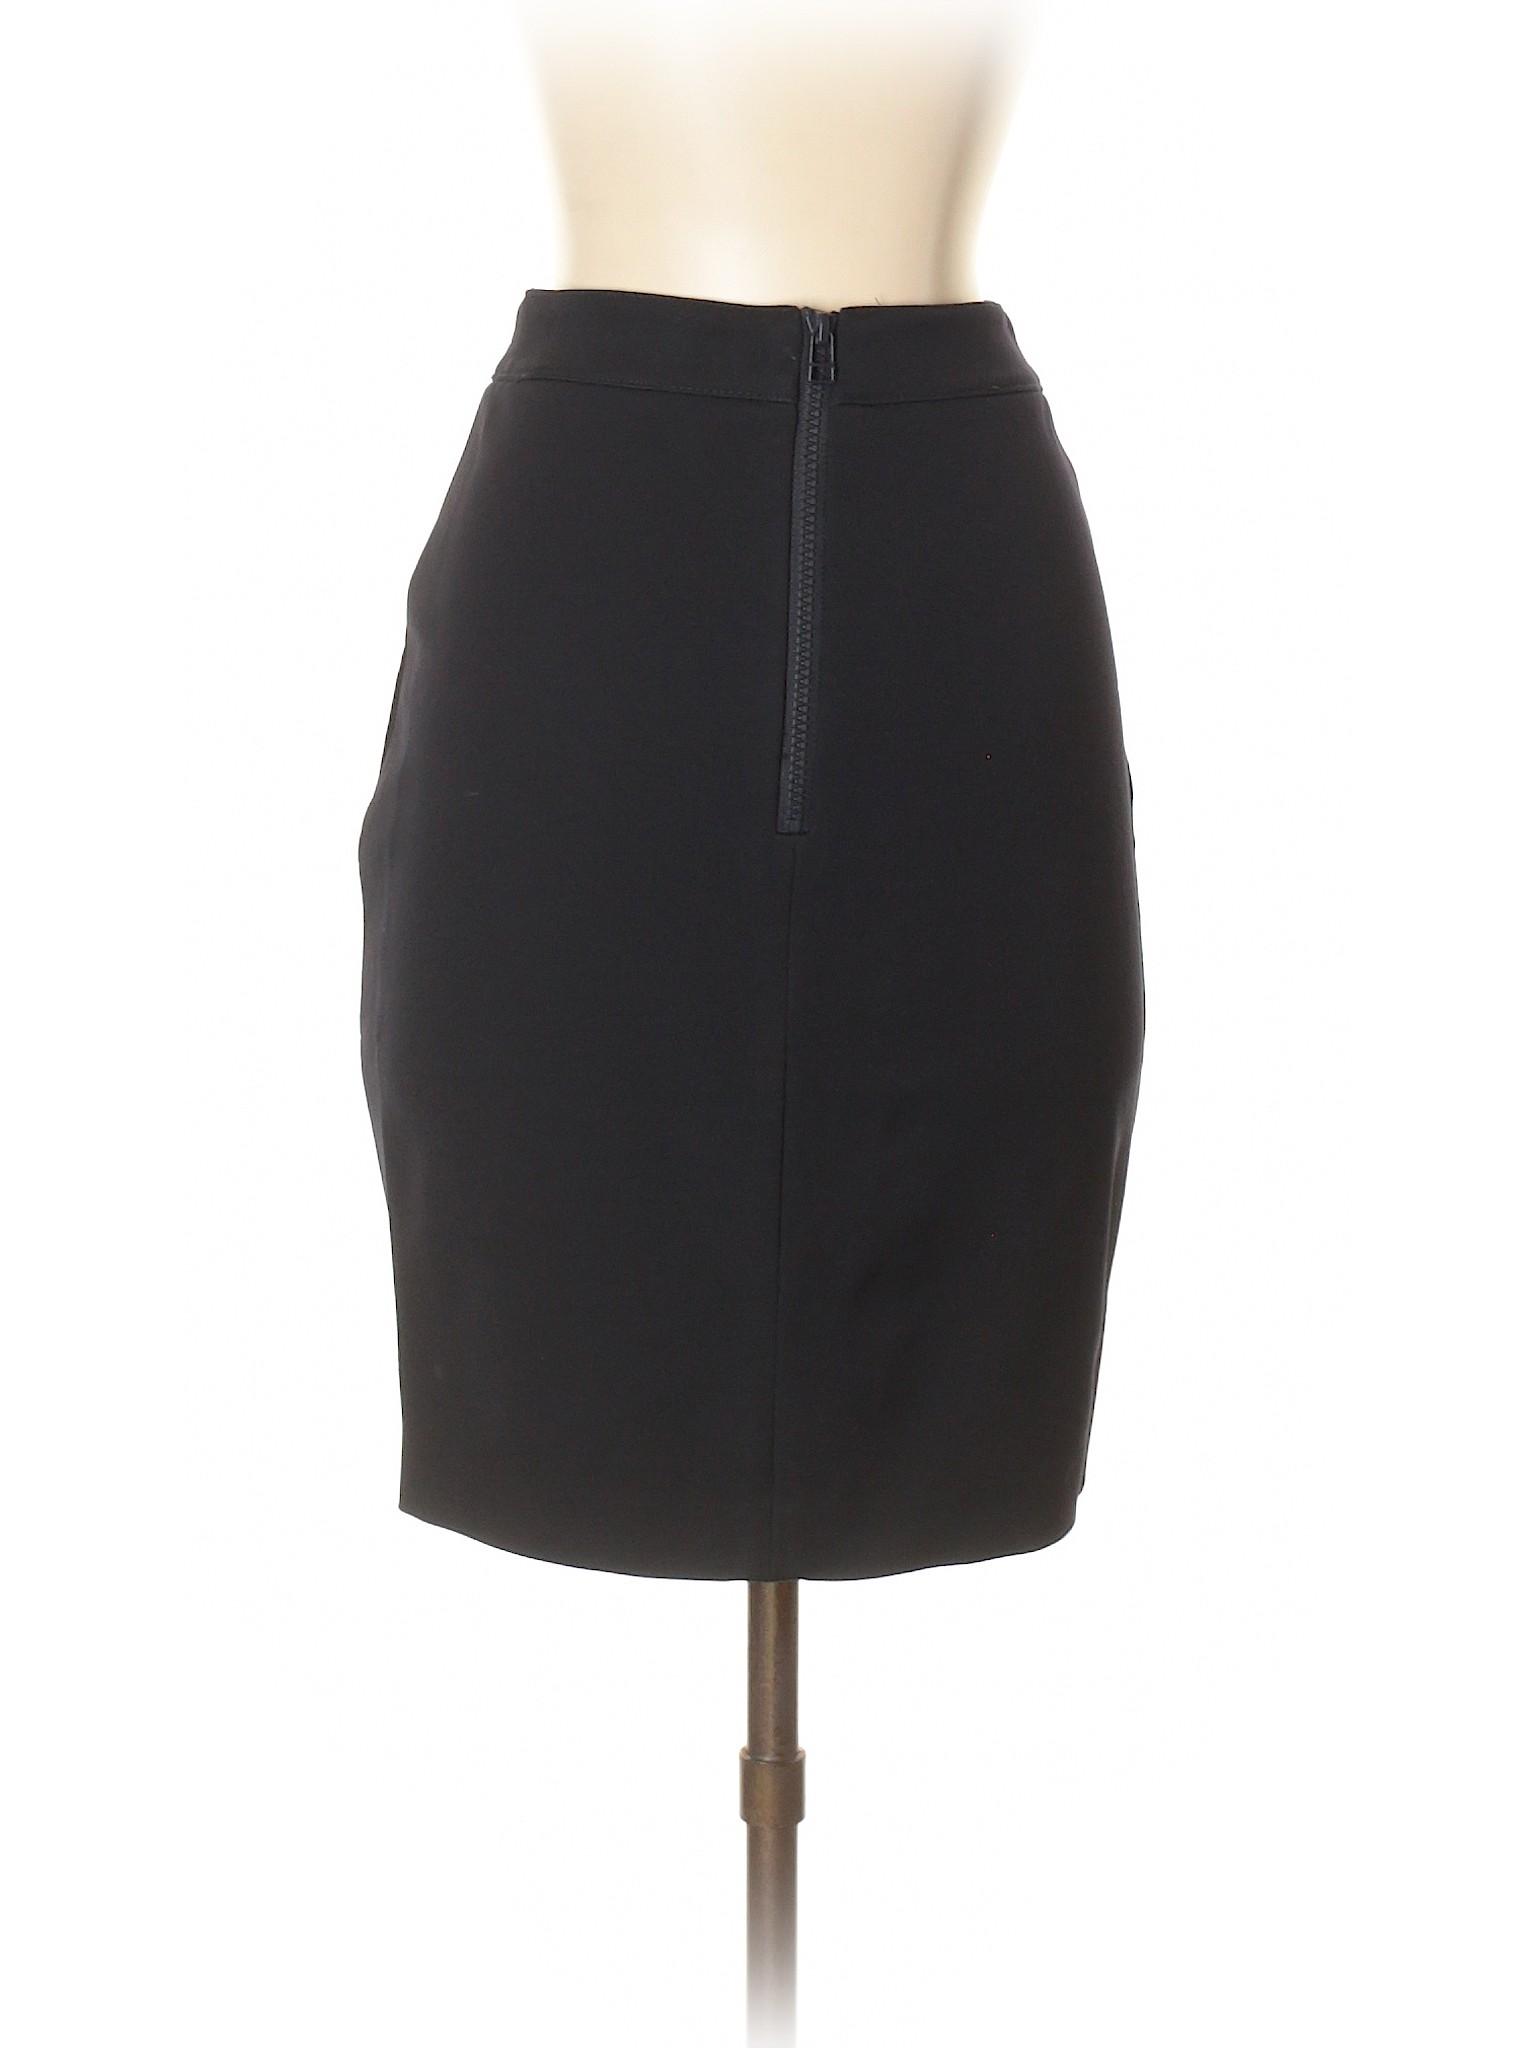 Casual Casual Skirt Skirt Skirt Boutique Casual Boutique Skirt Boutique Casual Boutique 60Eqw6A